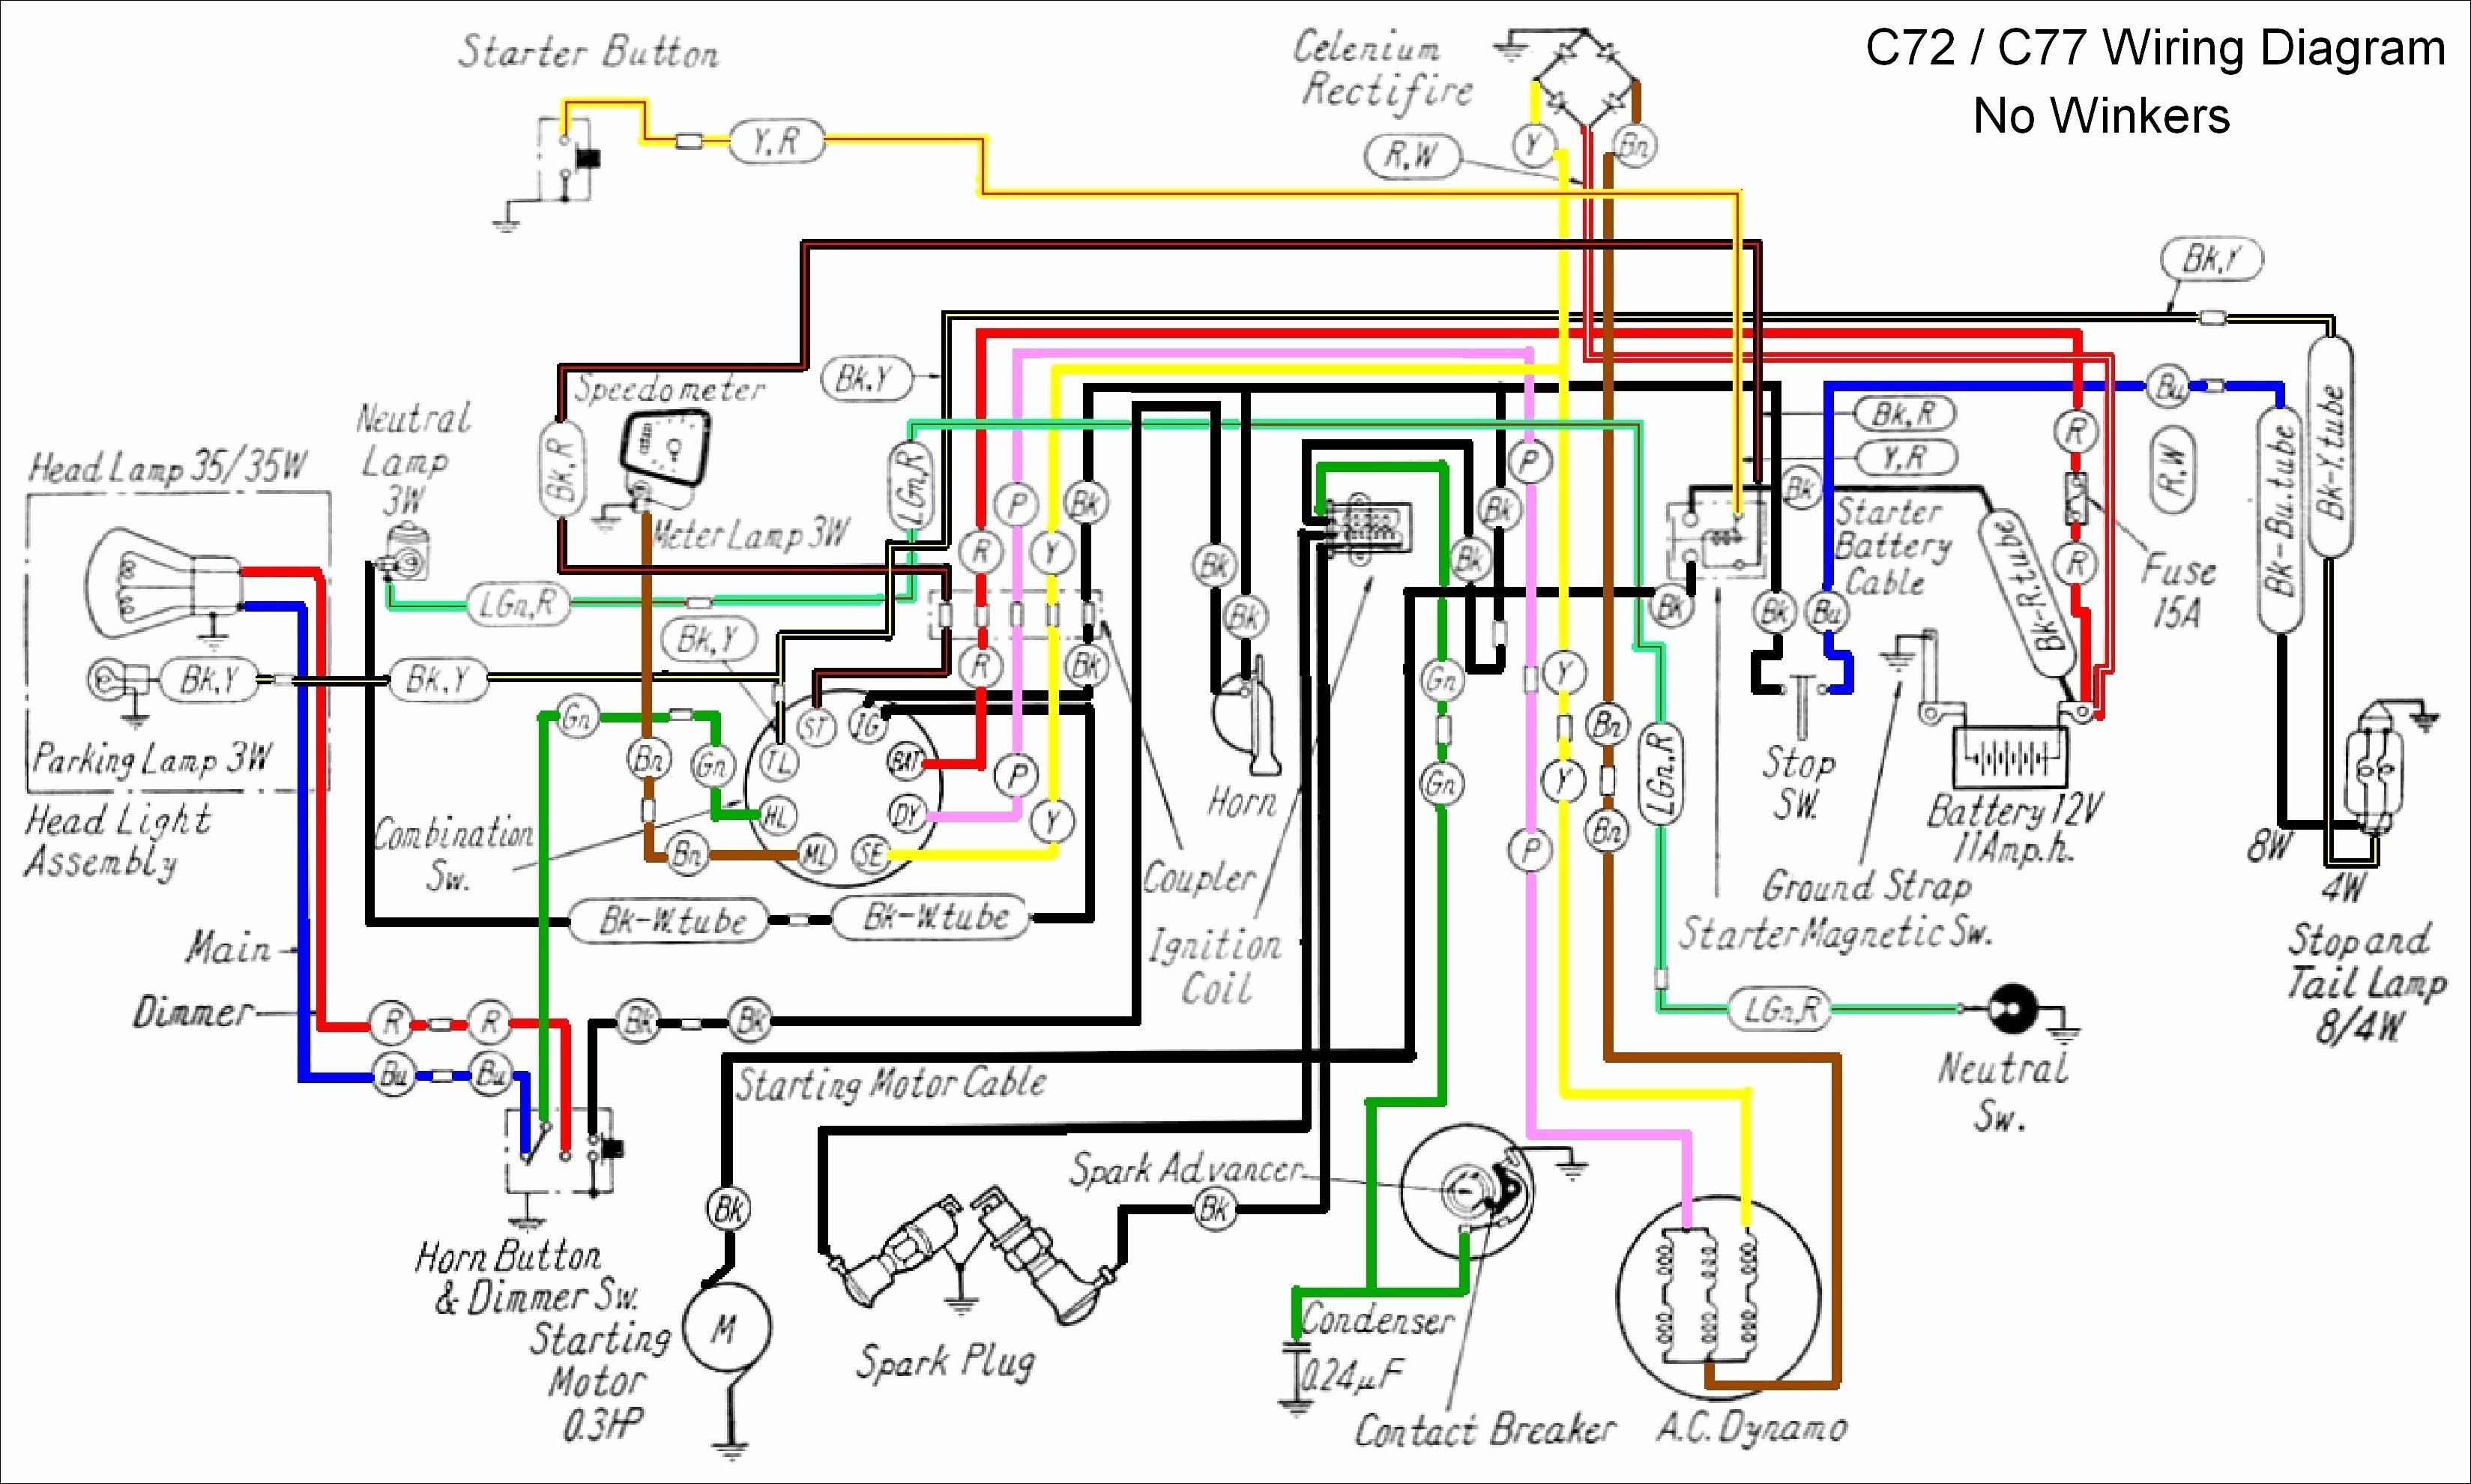 Bennett Trim Tab Wiring Diagram | Manual E-Books - Bennett Trim Tab Wiring Diagram